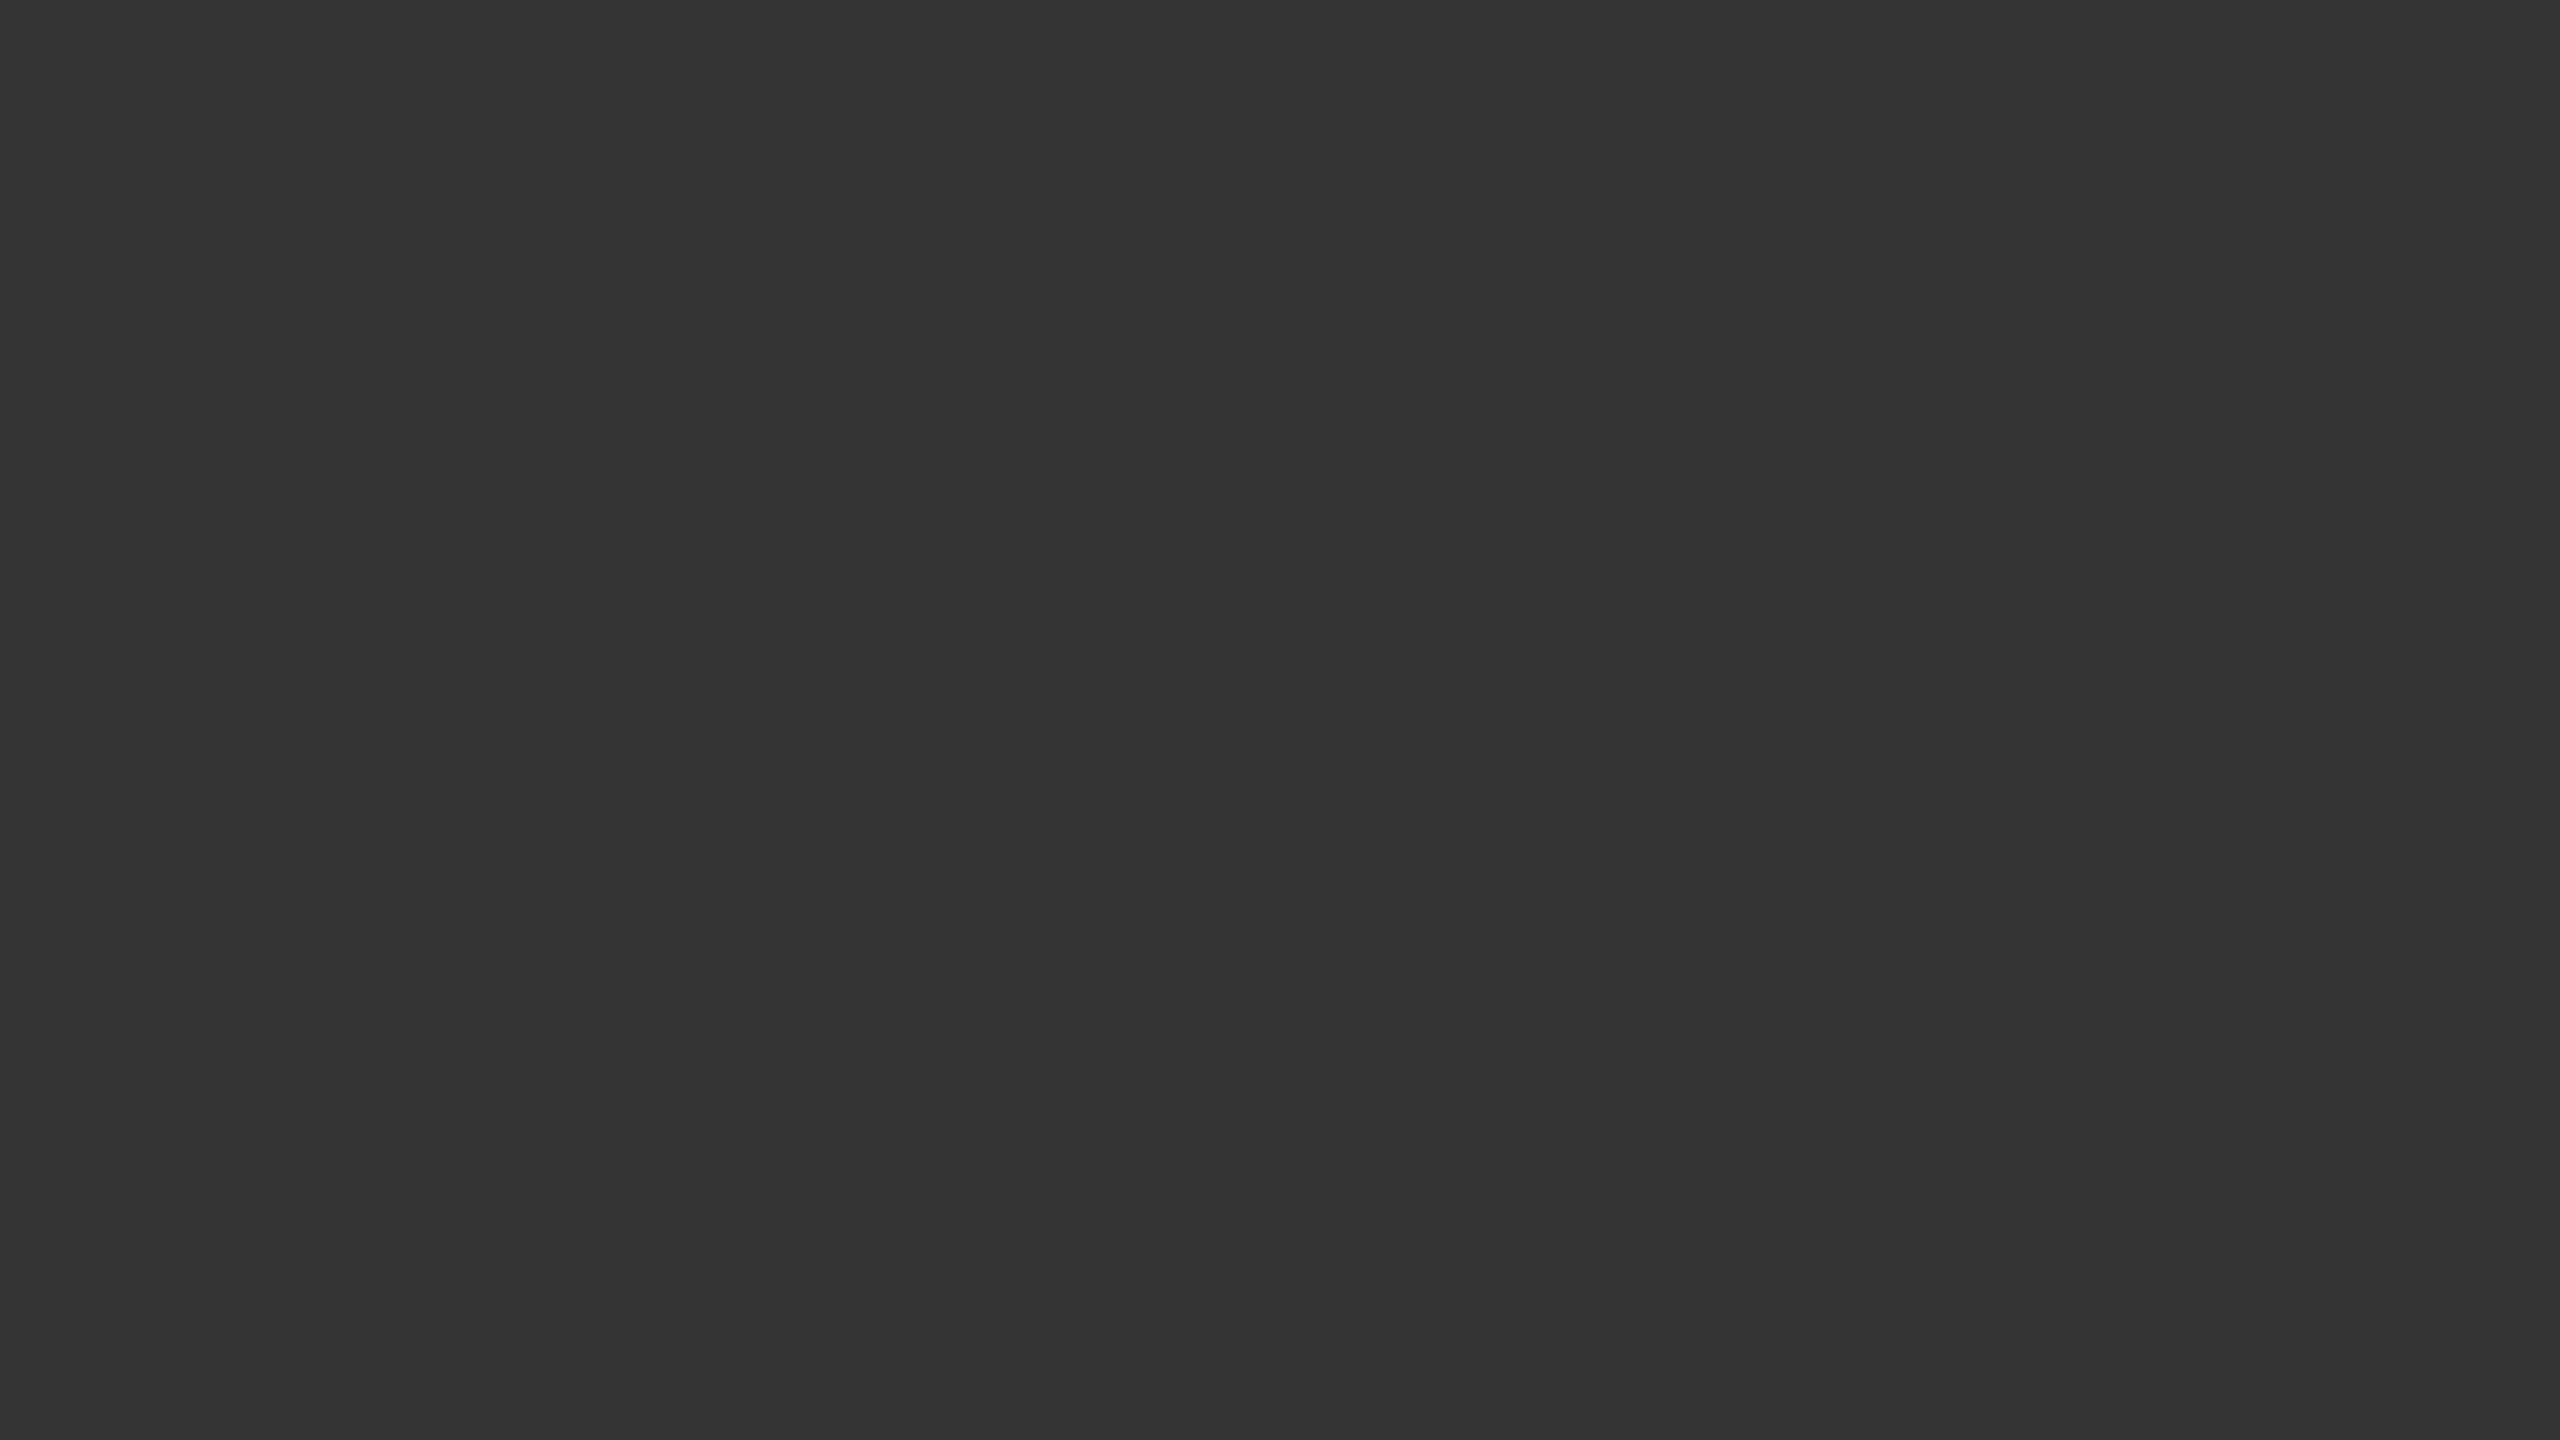 this Dark Gray Desktop Wallpaper is easy. Just save the wallpaper .